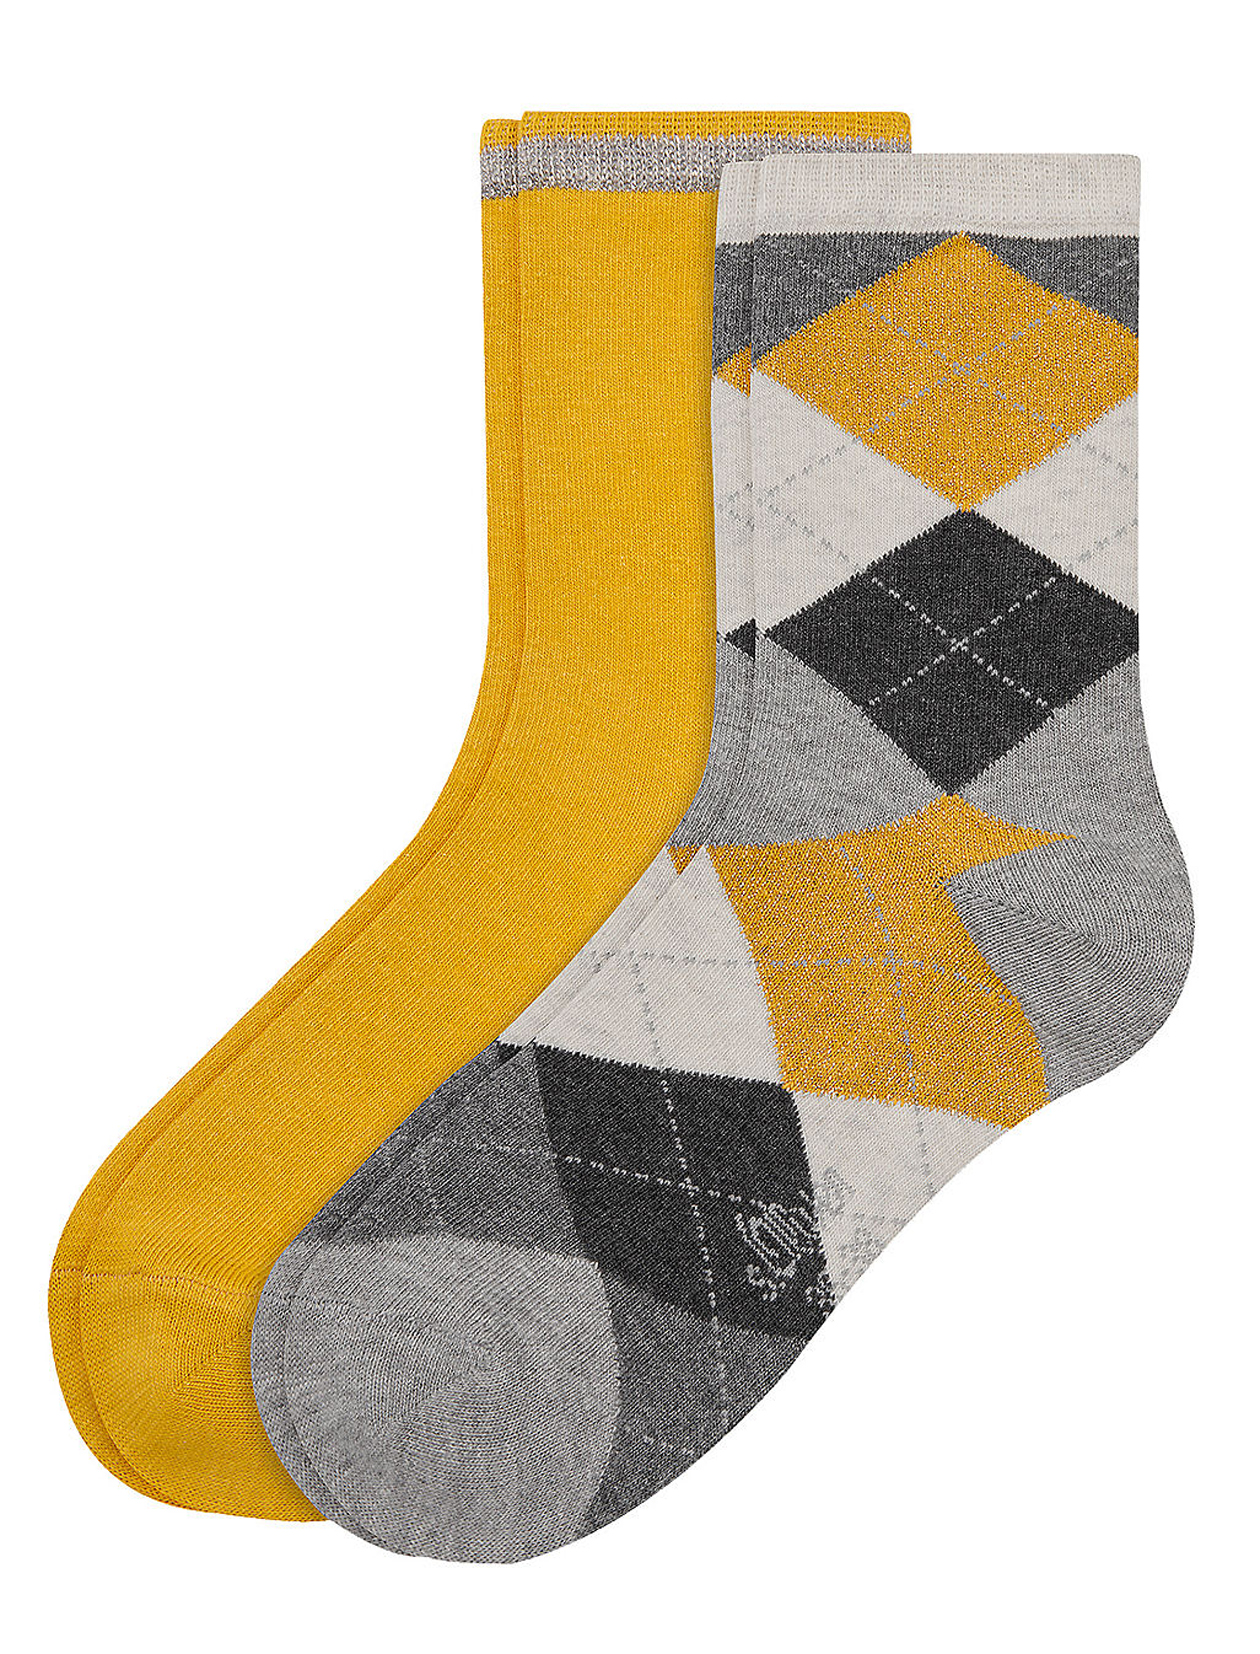 Ferse Bündchen 39//42 NEU 1 Paar bunt gestreifte Socken mit oranger Spitze